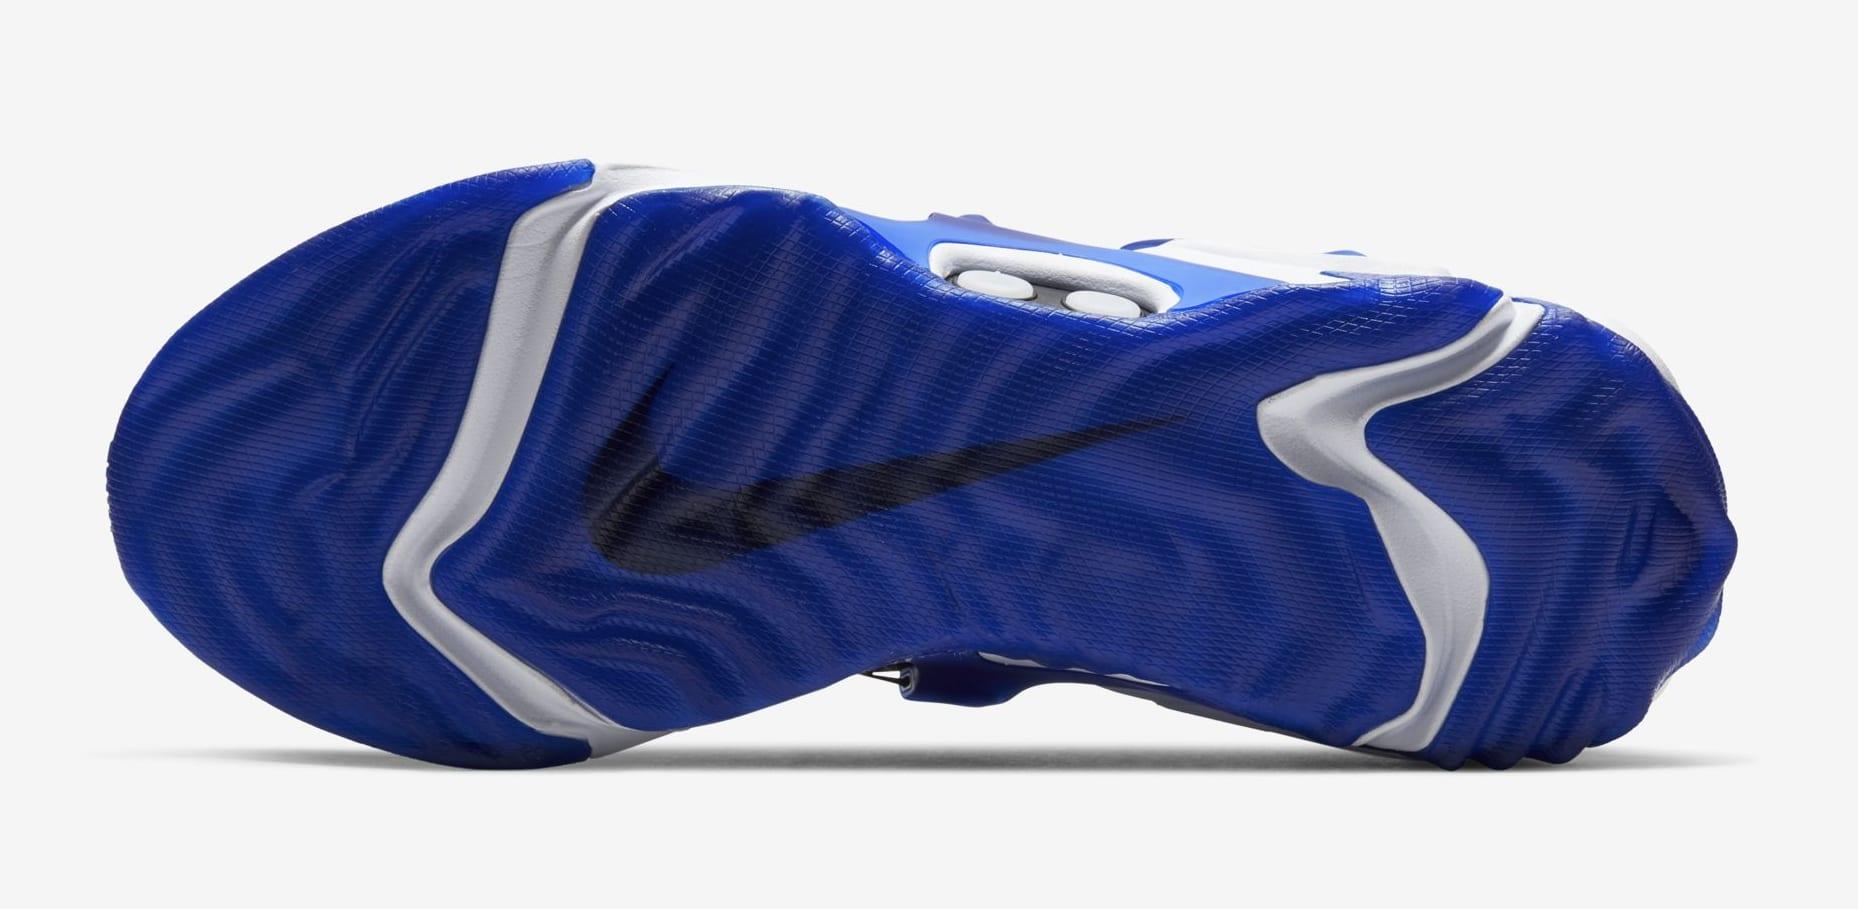 nike-adapt-huarache-black-racer-blue-outsole